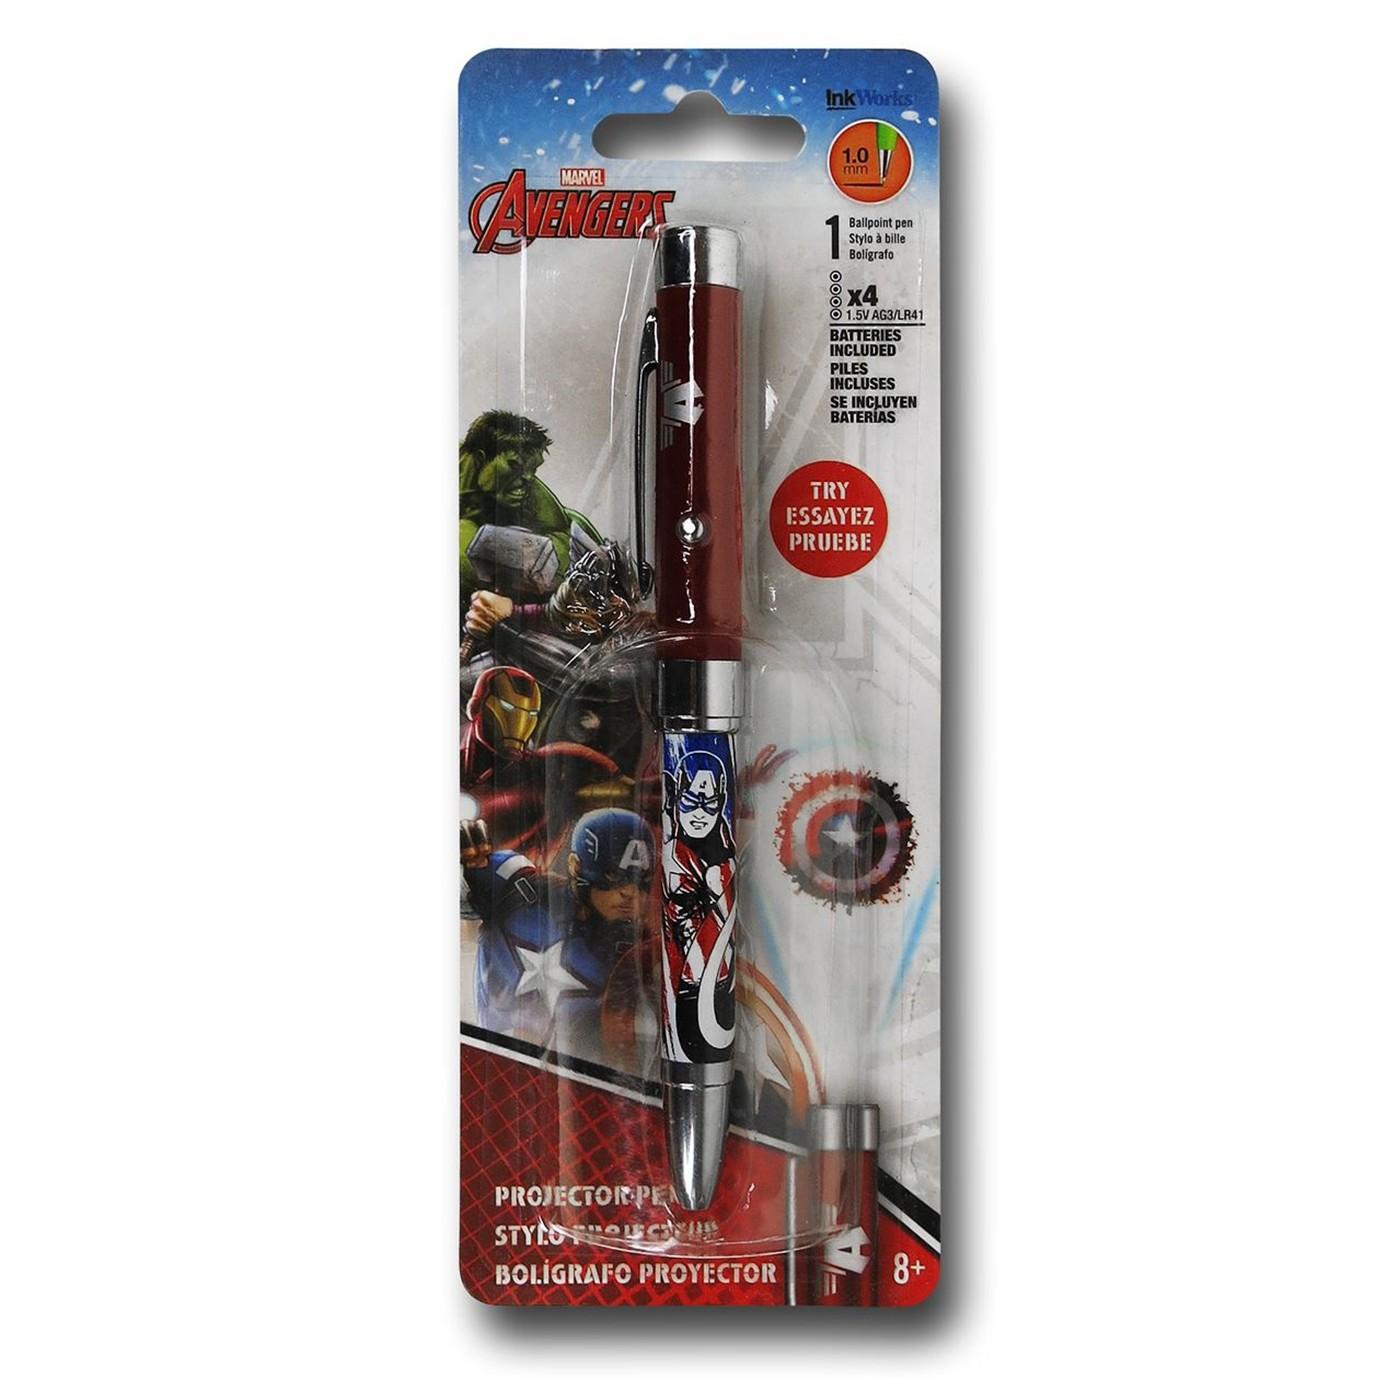 Captain America Avengers Assemble Pen